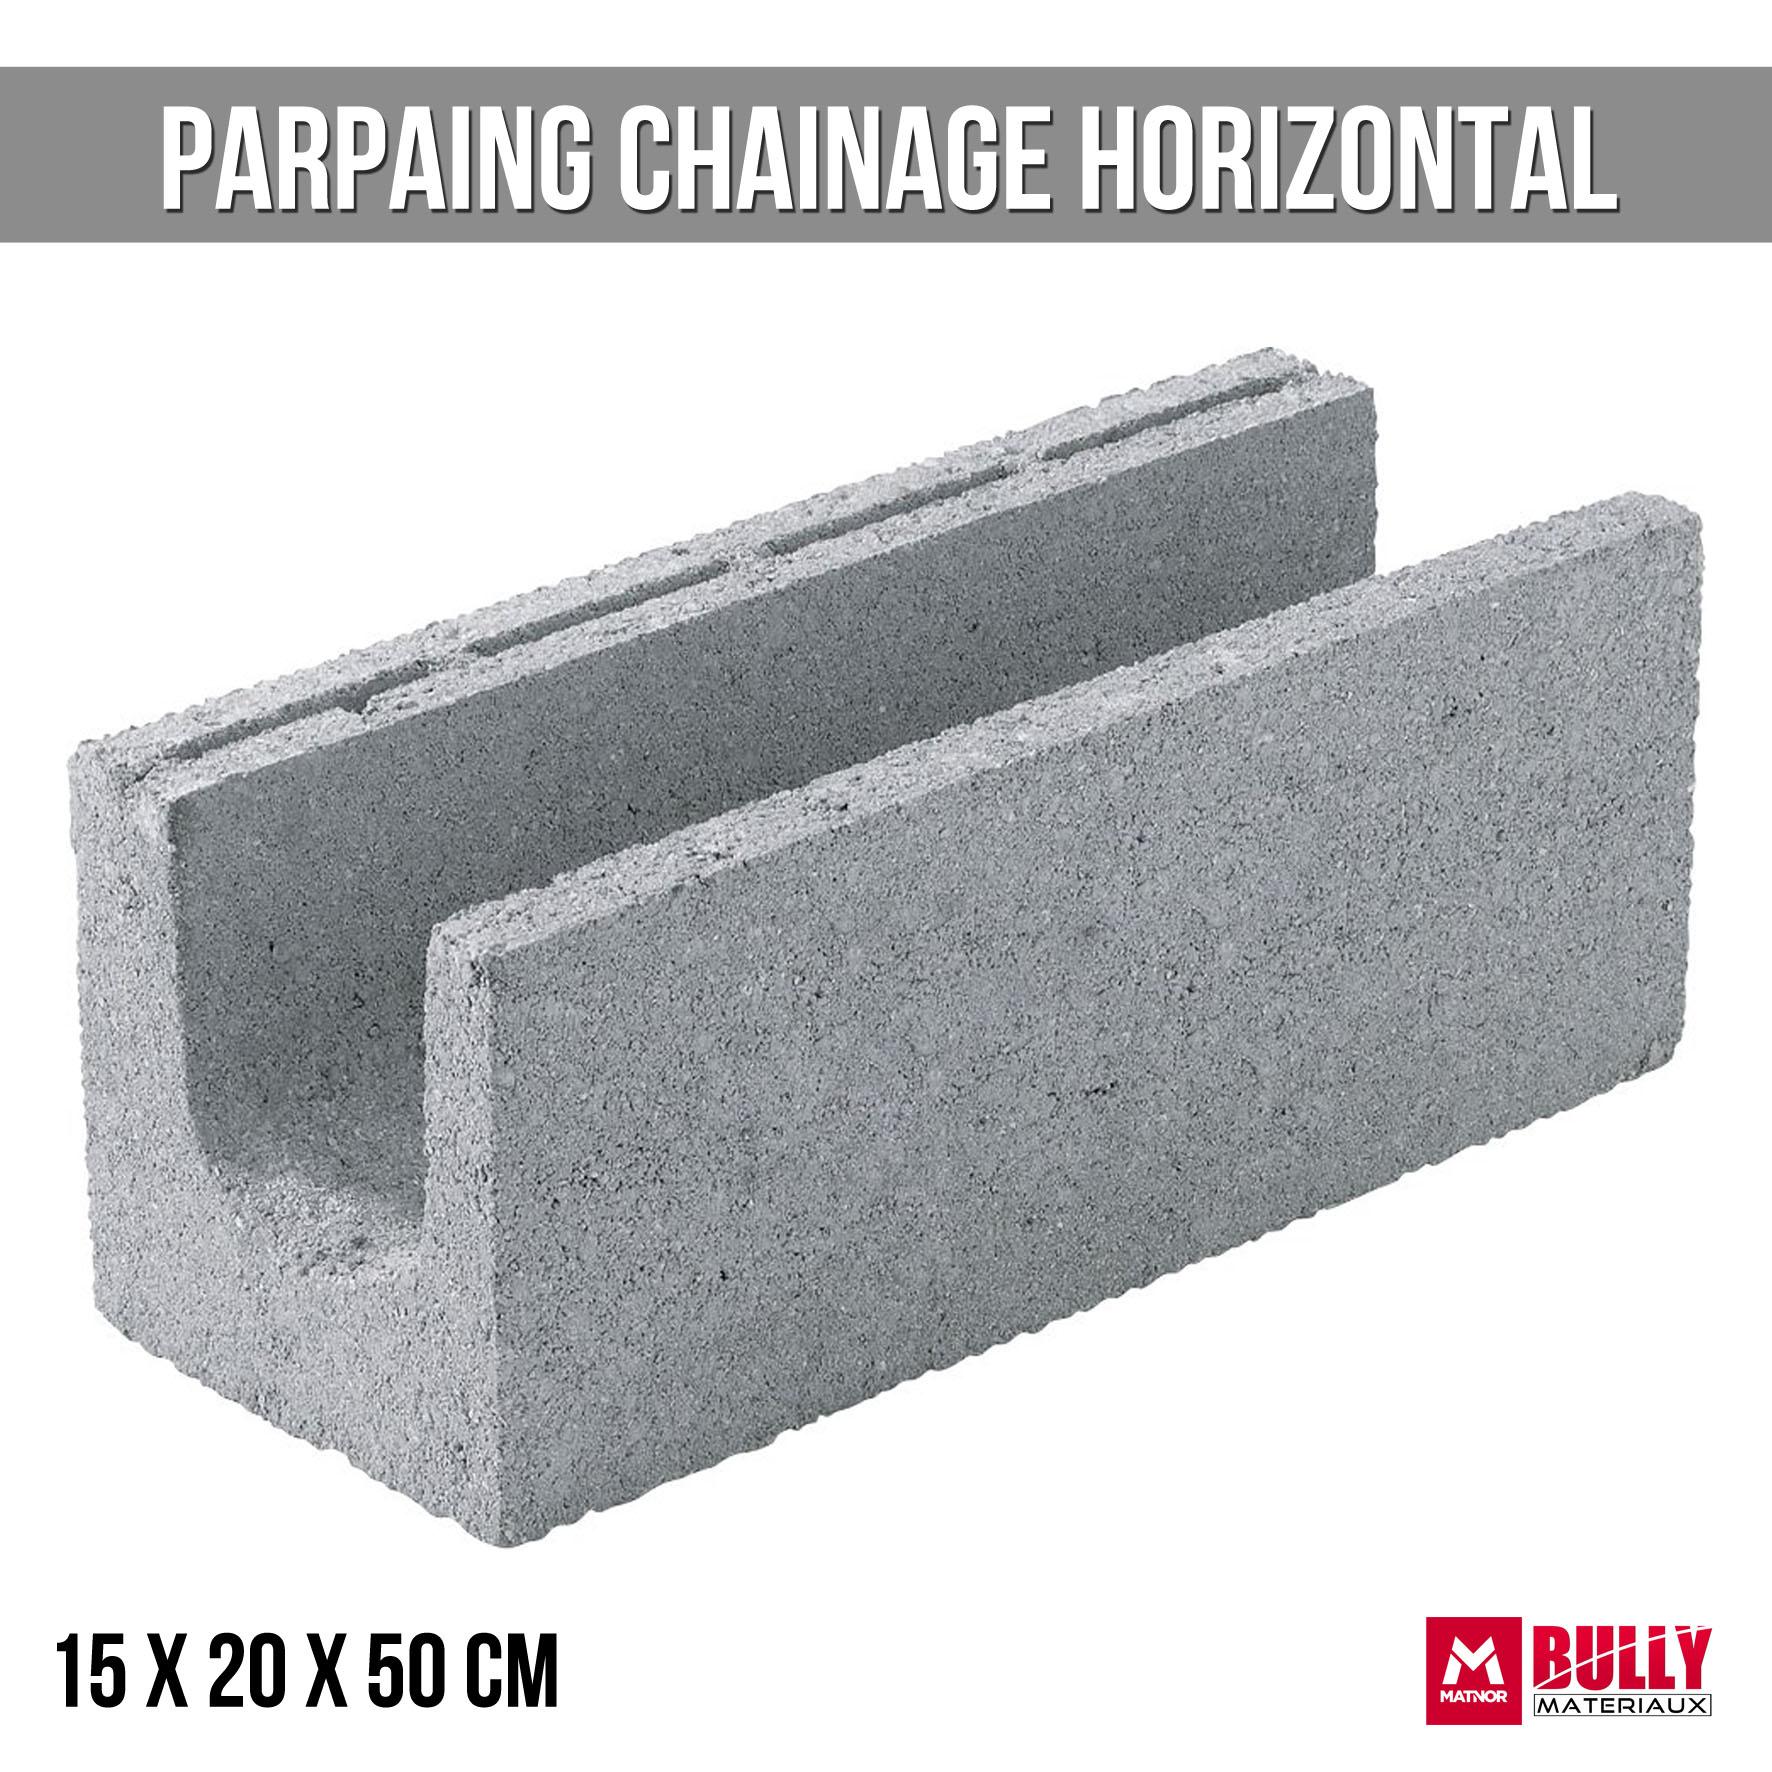 Parpaing ch horizontal 15